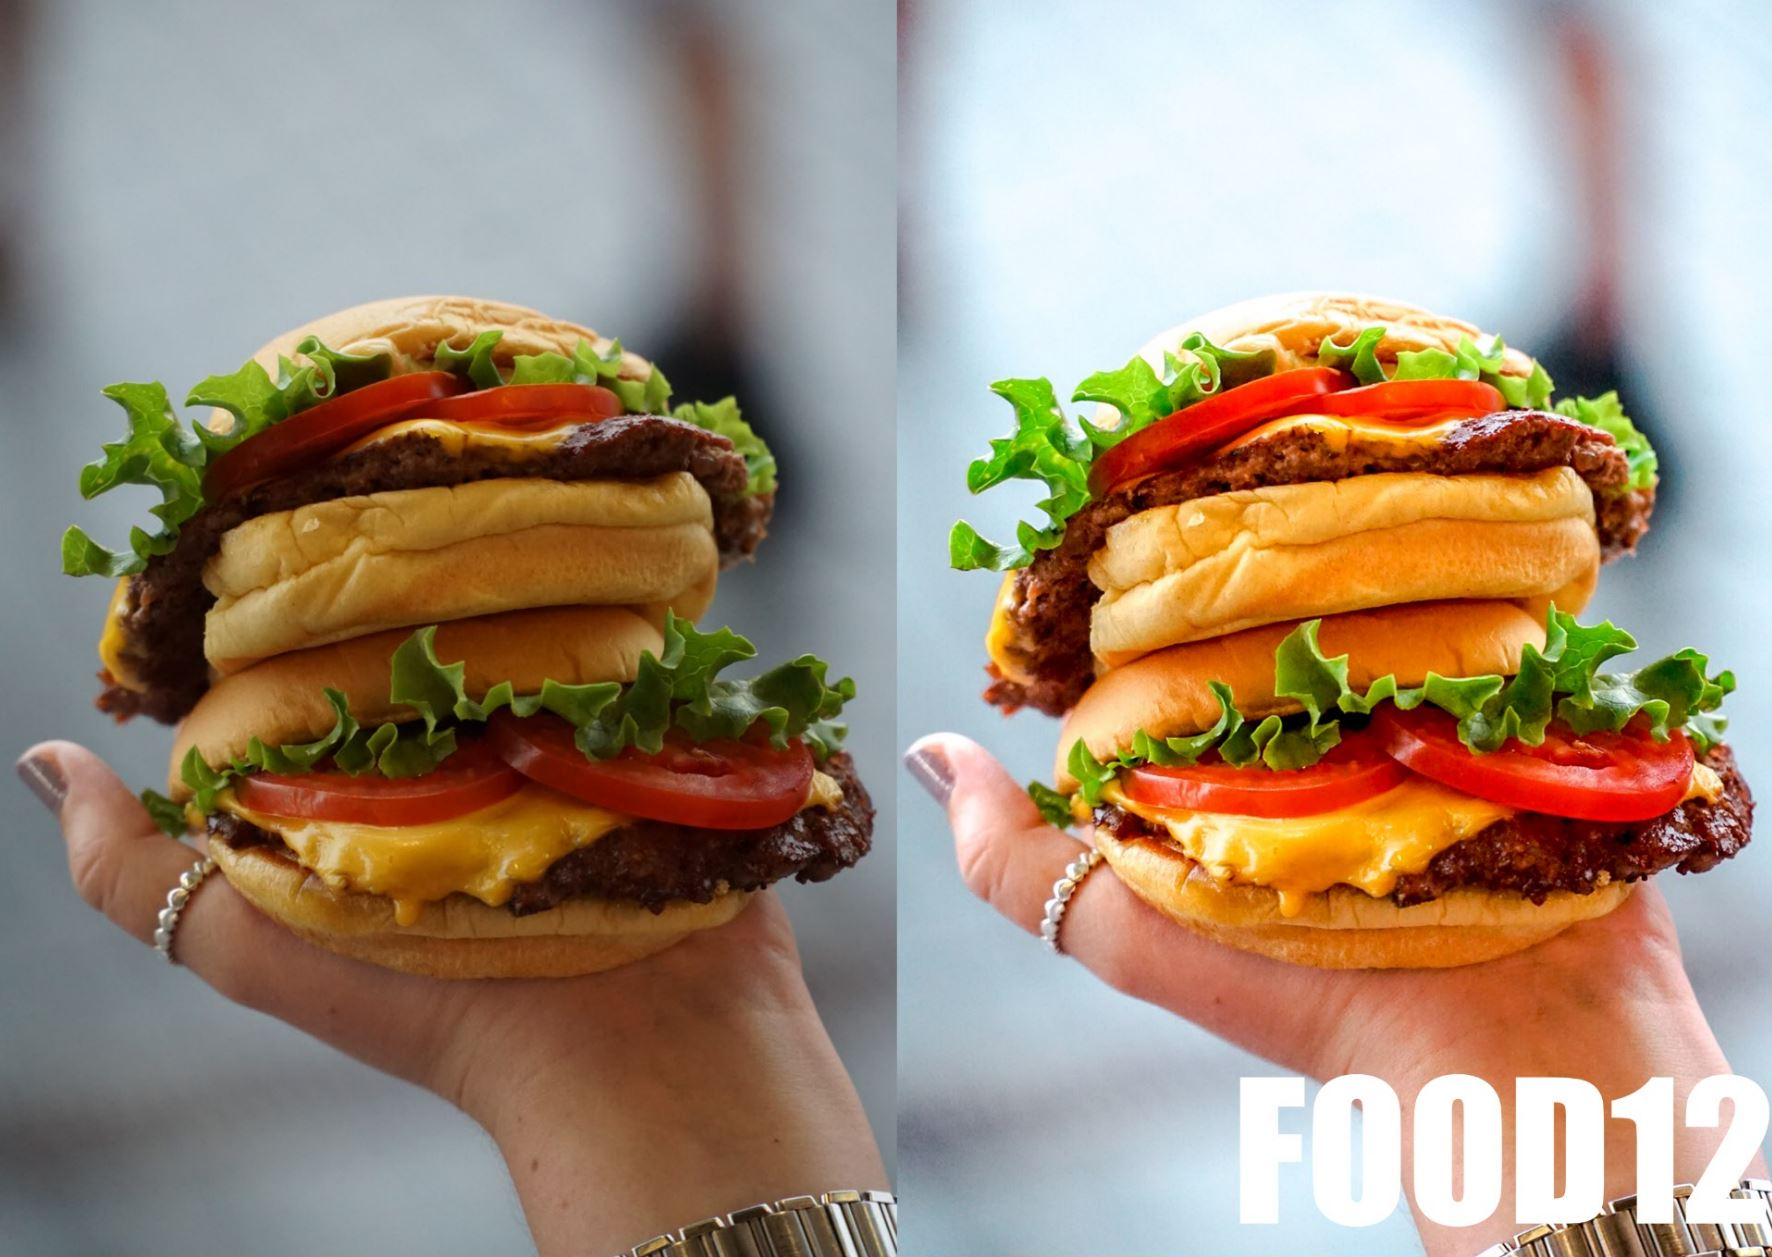 FOOD12redo.JPG